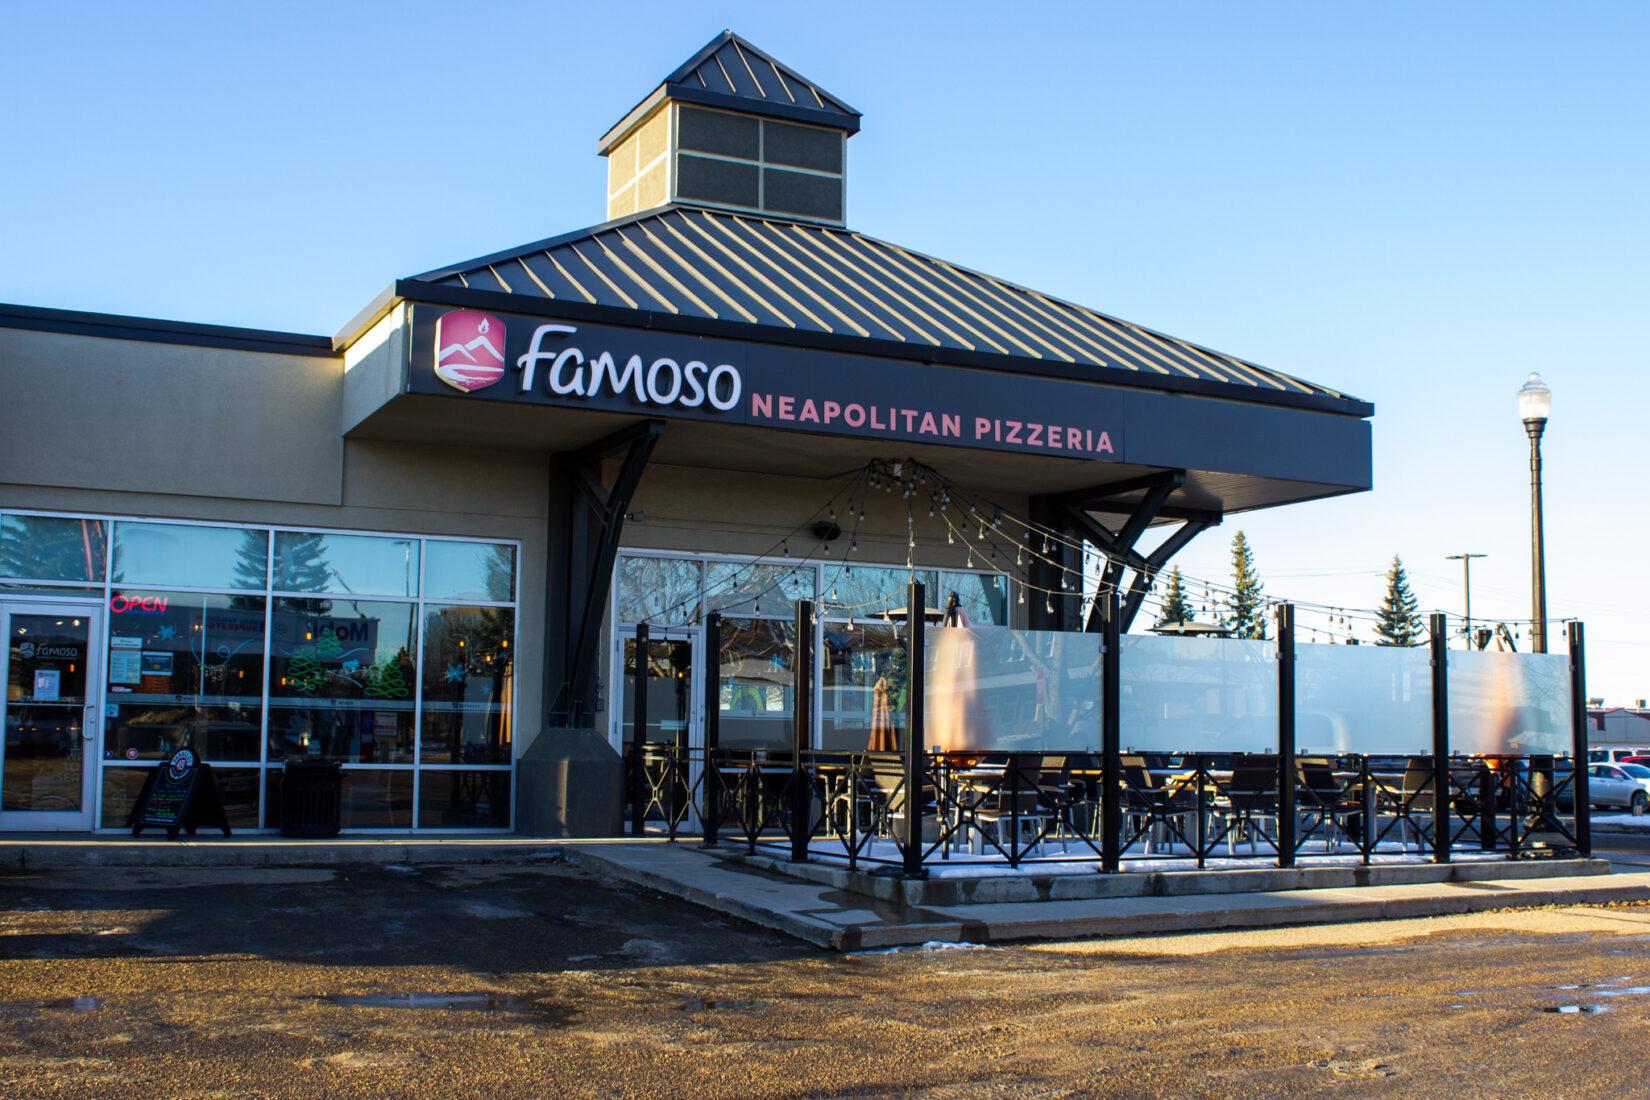 Business Spotlight: Famoso Neapolitan Pizzeria